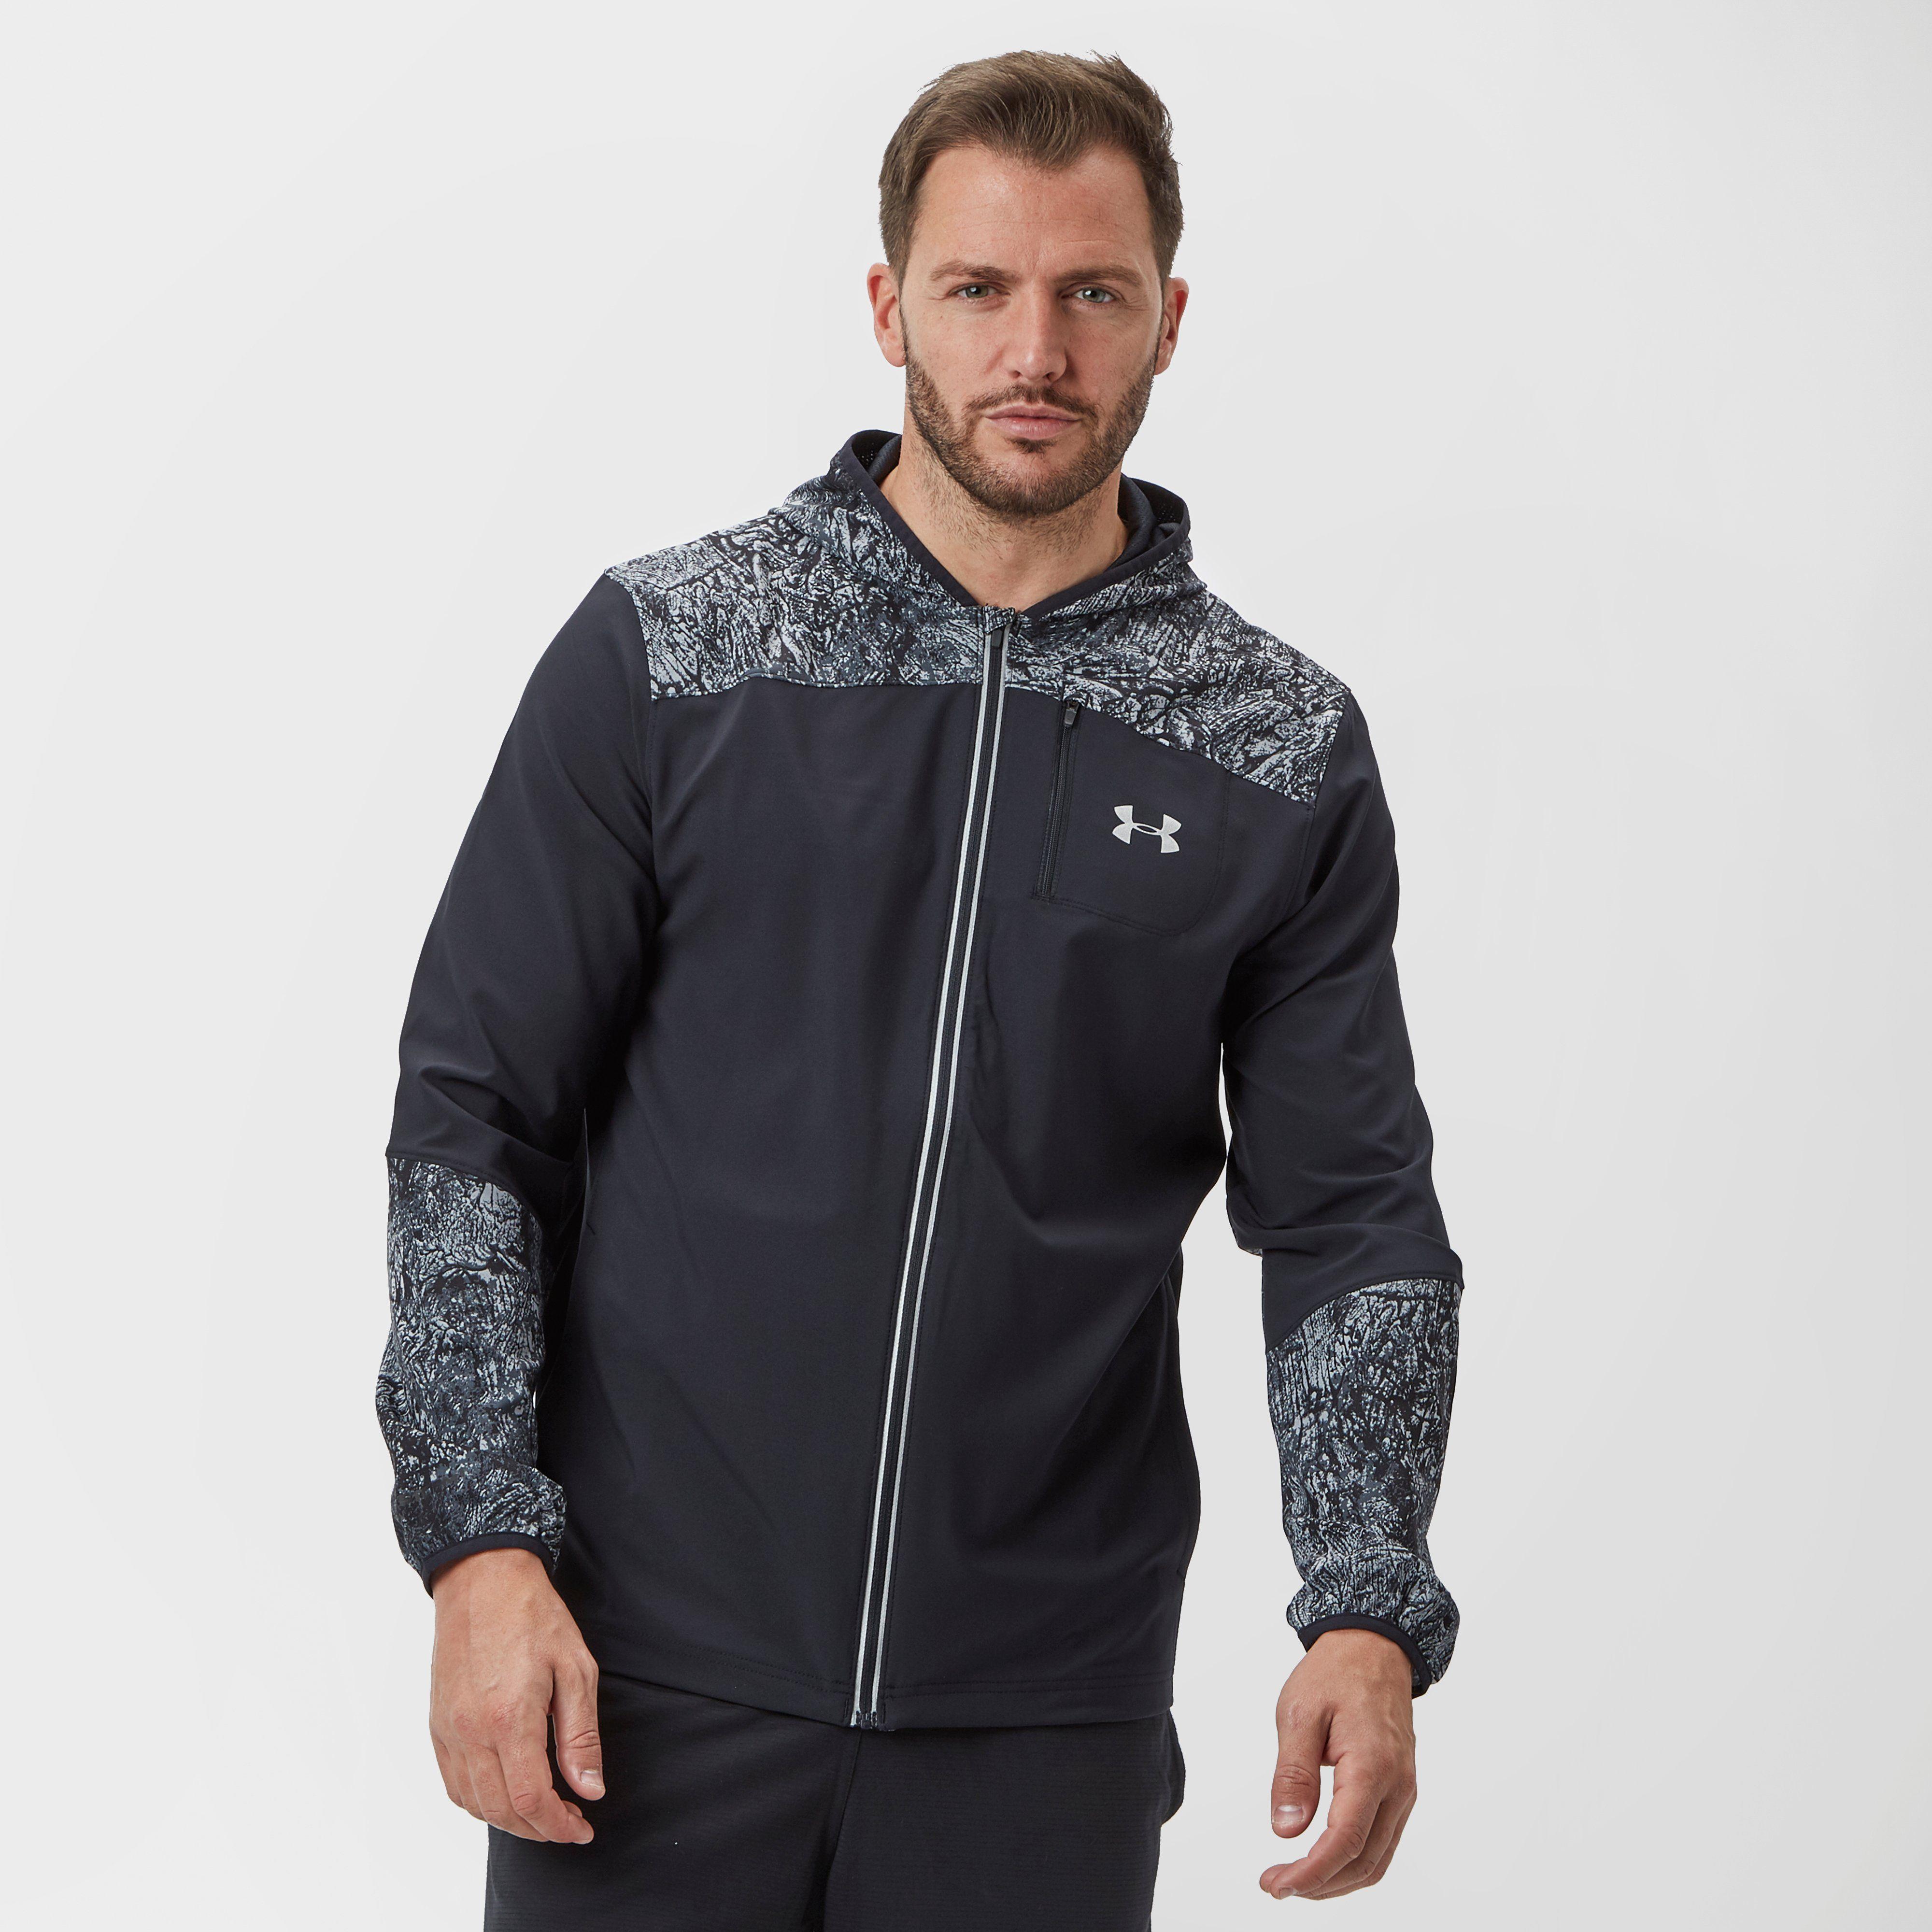 UNDER ARMOUR Men's UA Storm Elements Jacket